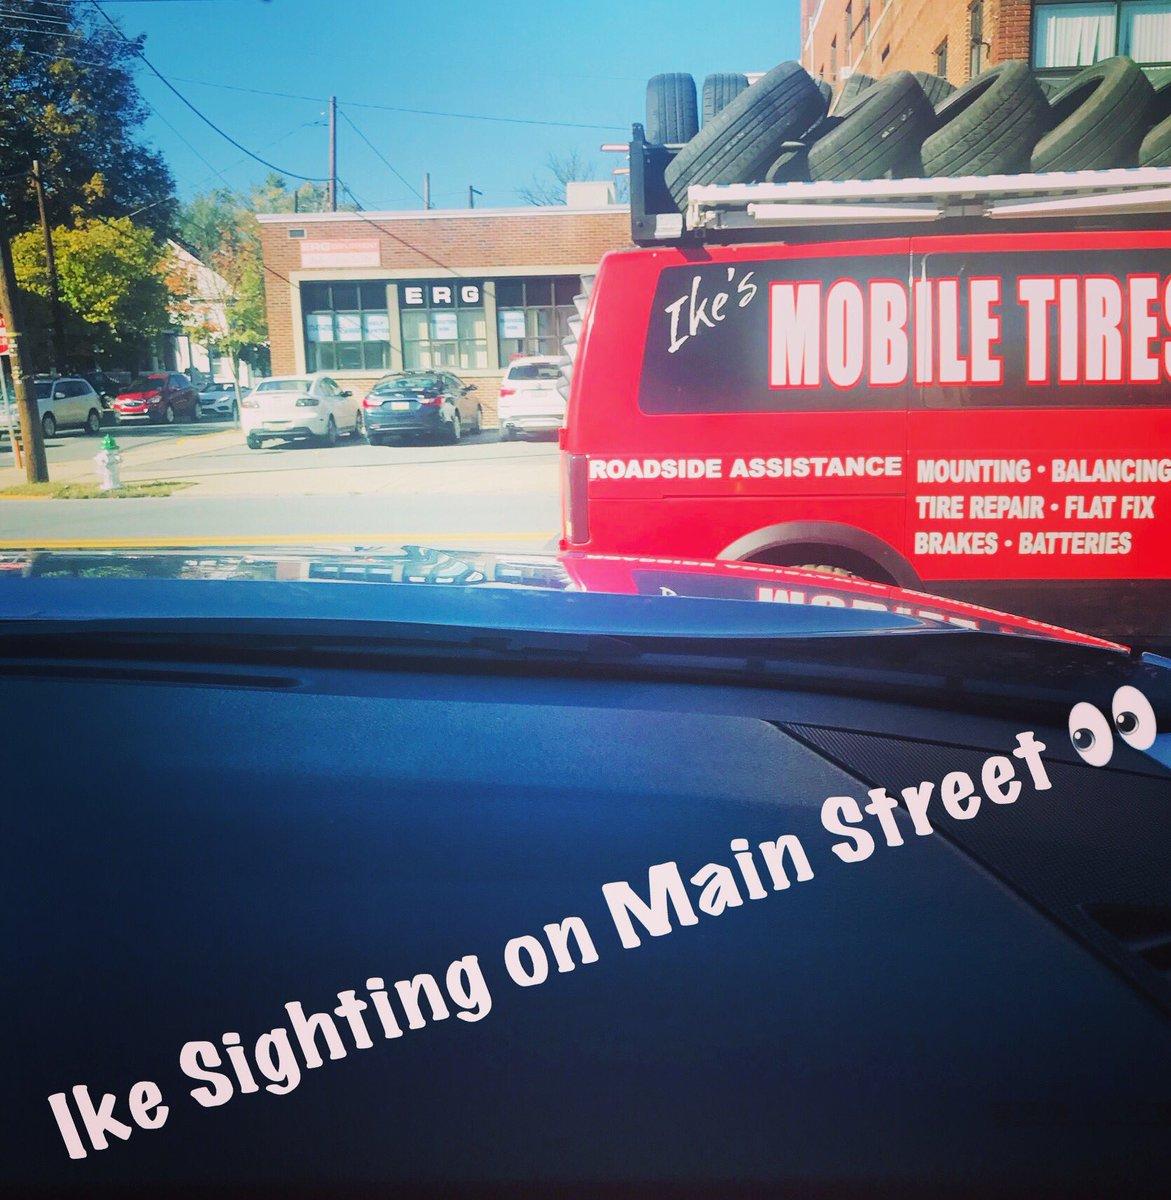 Find Ike    #ikesmobiletires #convenience #tepsbestmedia #ike #waldo #sighting #mikeandike #cars #truck #fleet #mechanic #emergency #service #sos #main #street #poconos #stroudsburg #eaststroudsburg #pennsylvania #roadsideassistance #drive #safe #ontheroad #october #monday<br>http://pic.twitter.com/7pvkTdkggj